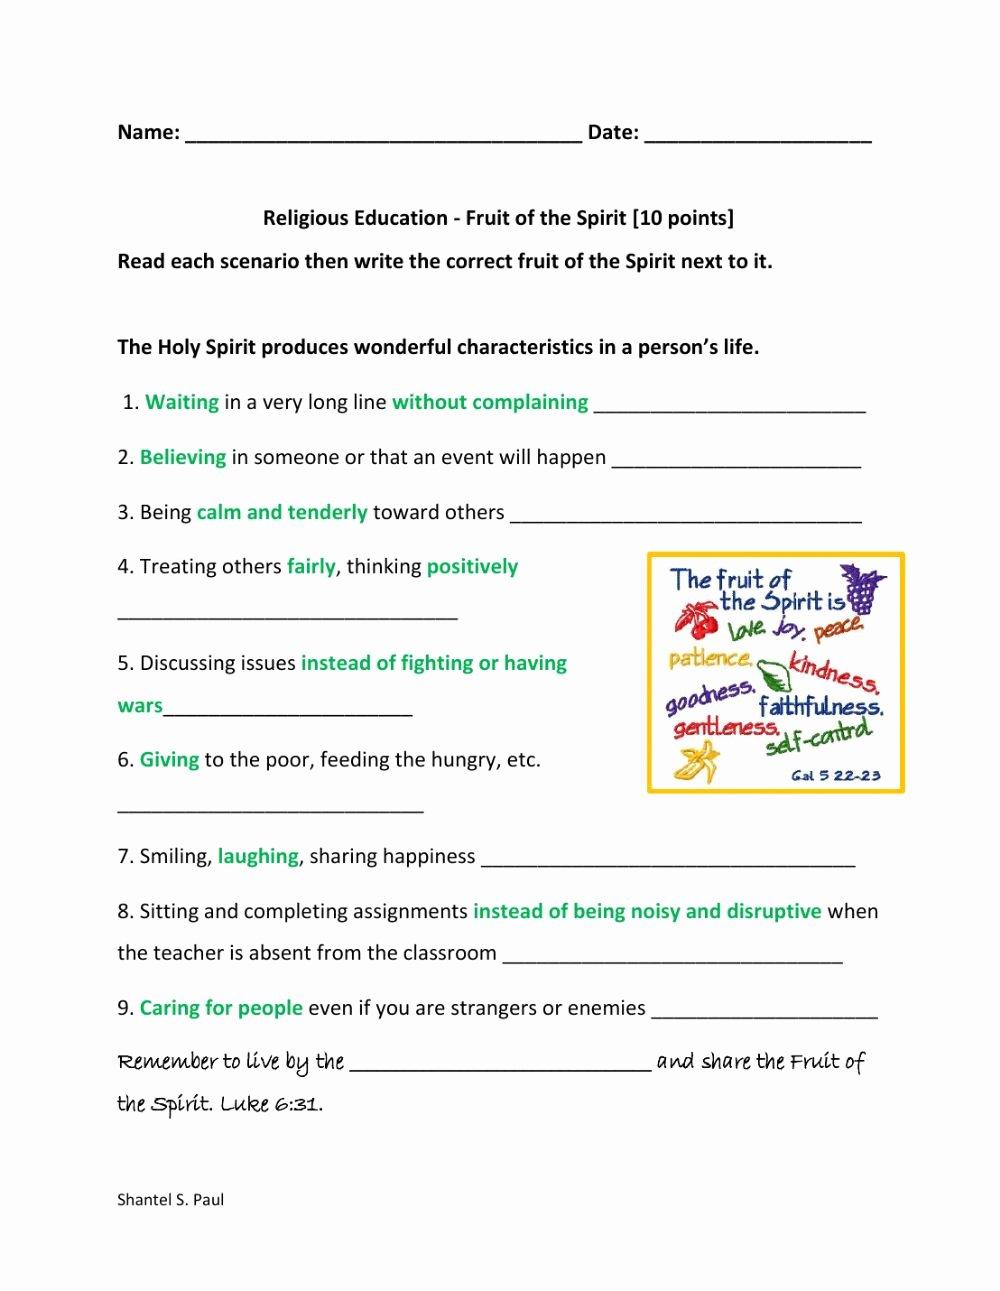 Fruits Of the Spirit Worksheet Ideas Fruit Of the Spirit Interactive Worksheet